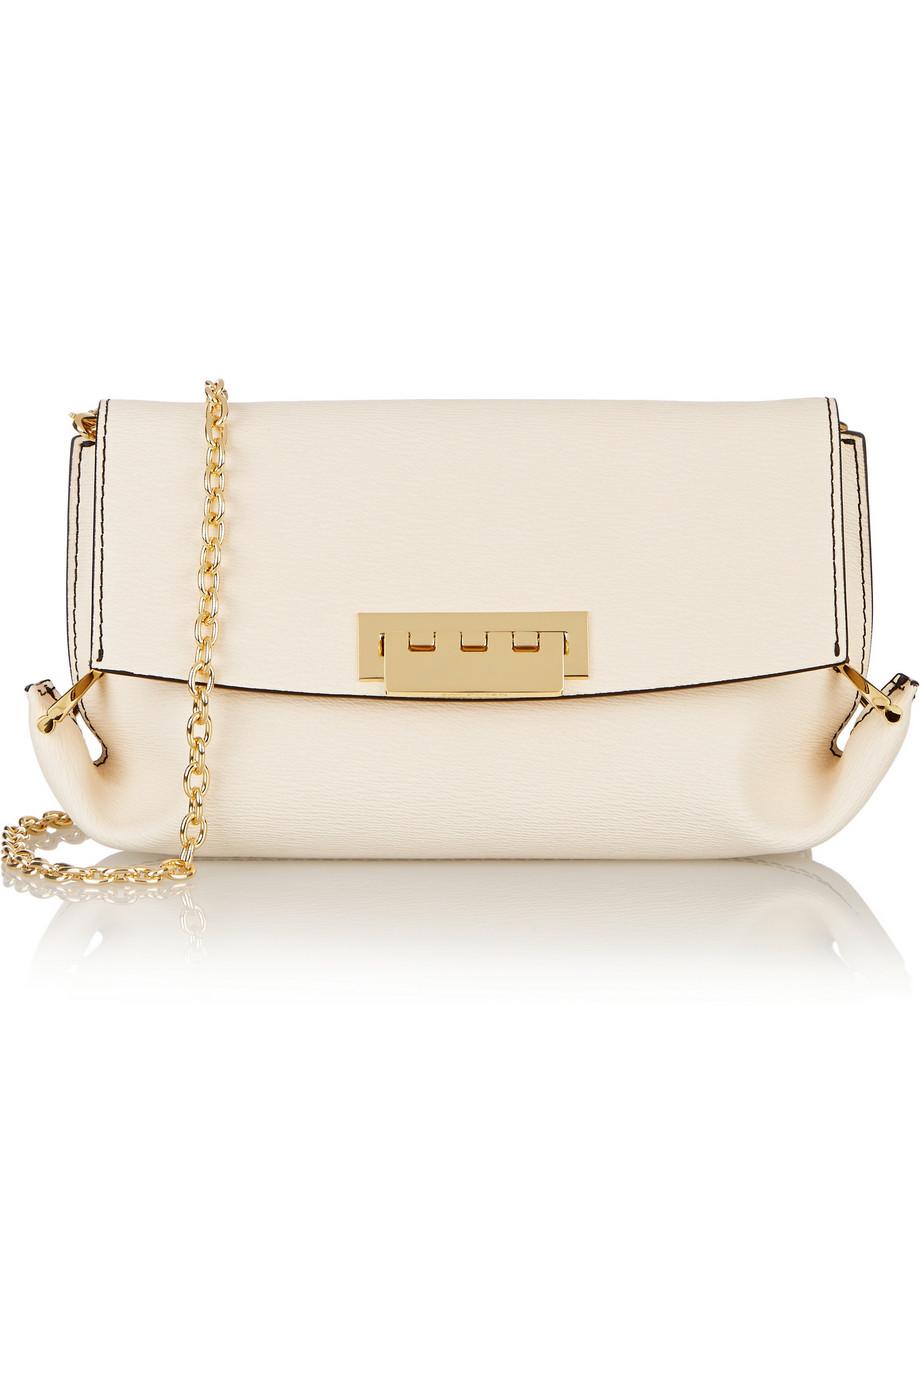 Zac Posen Eartha Leather Shoulder Bag $217.25